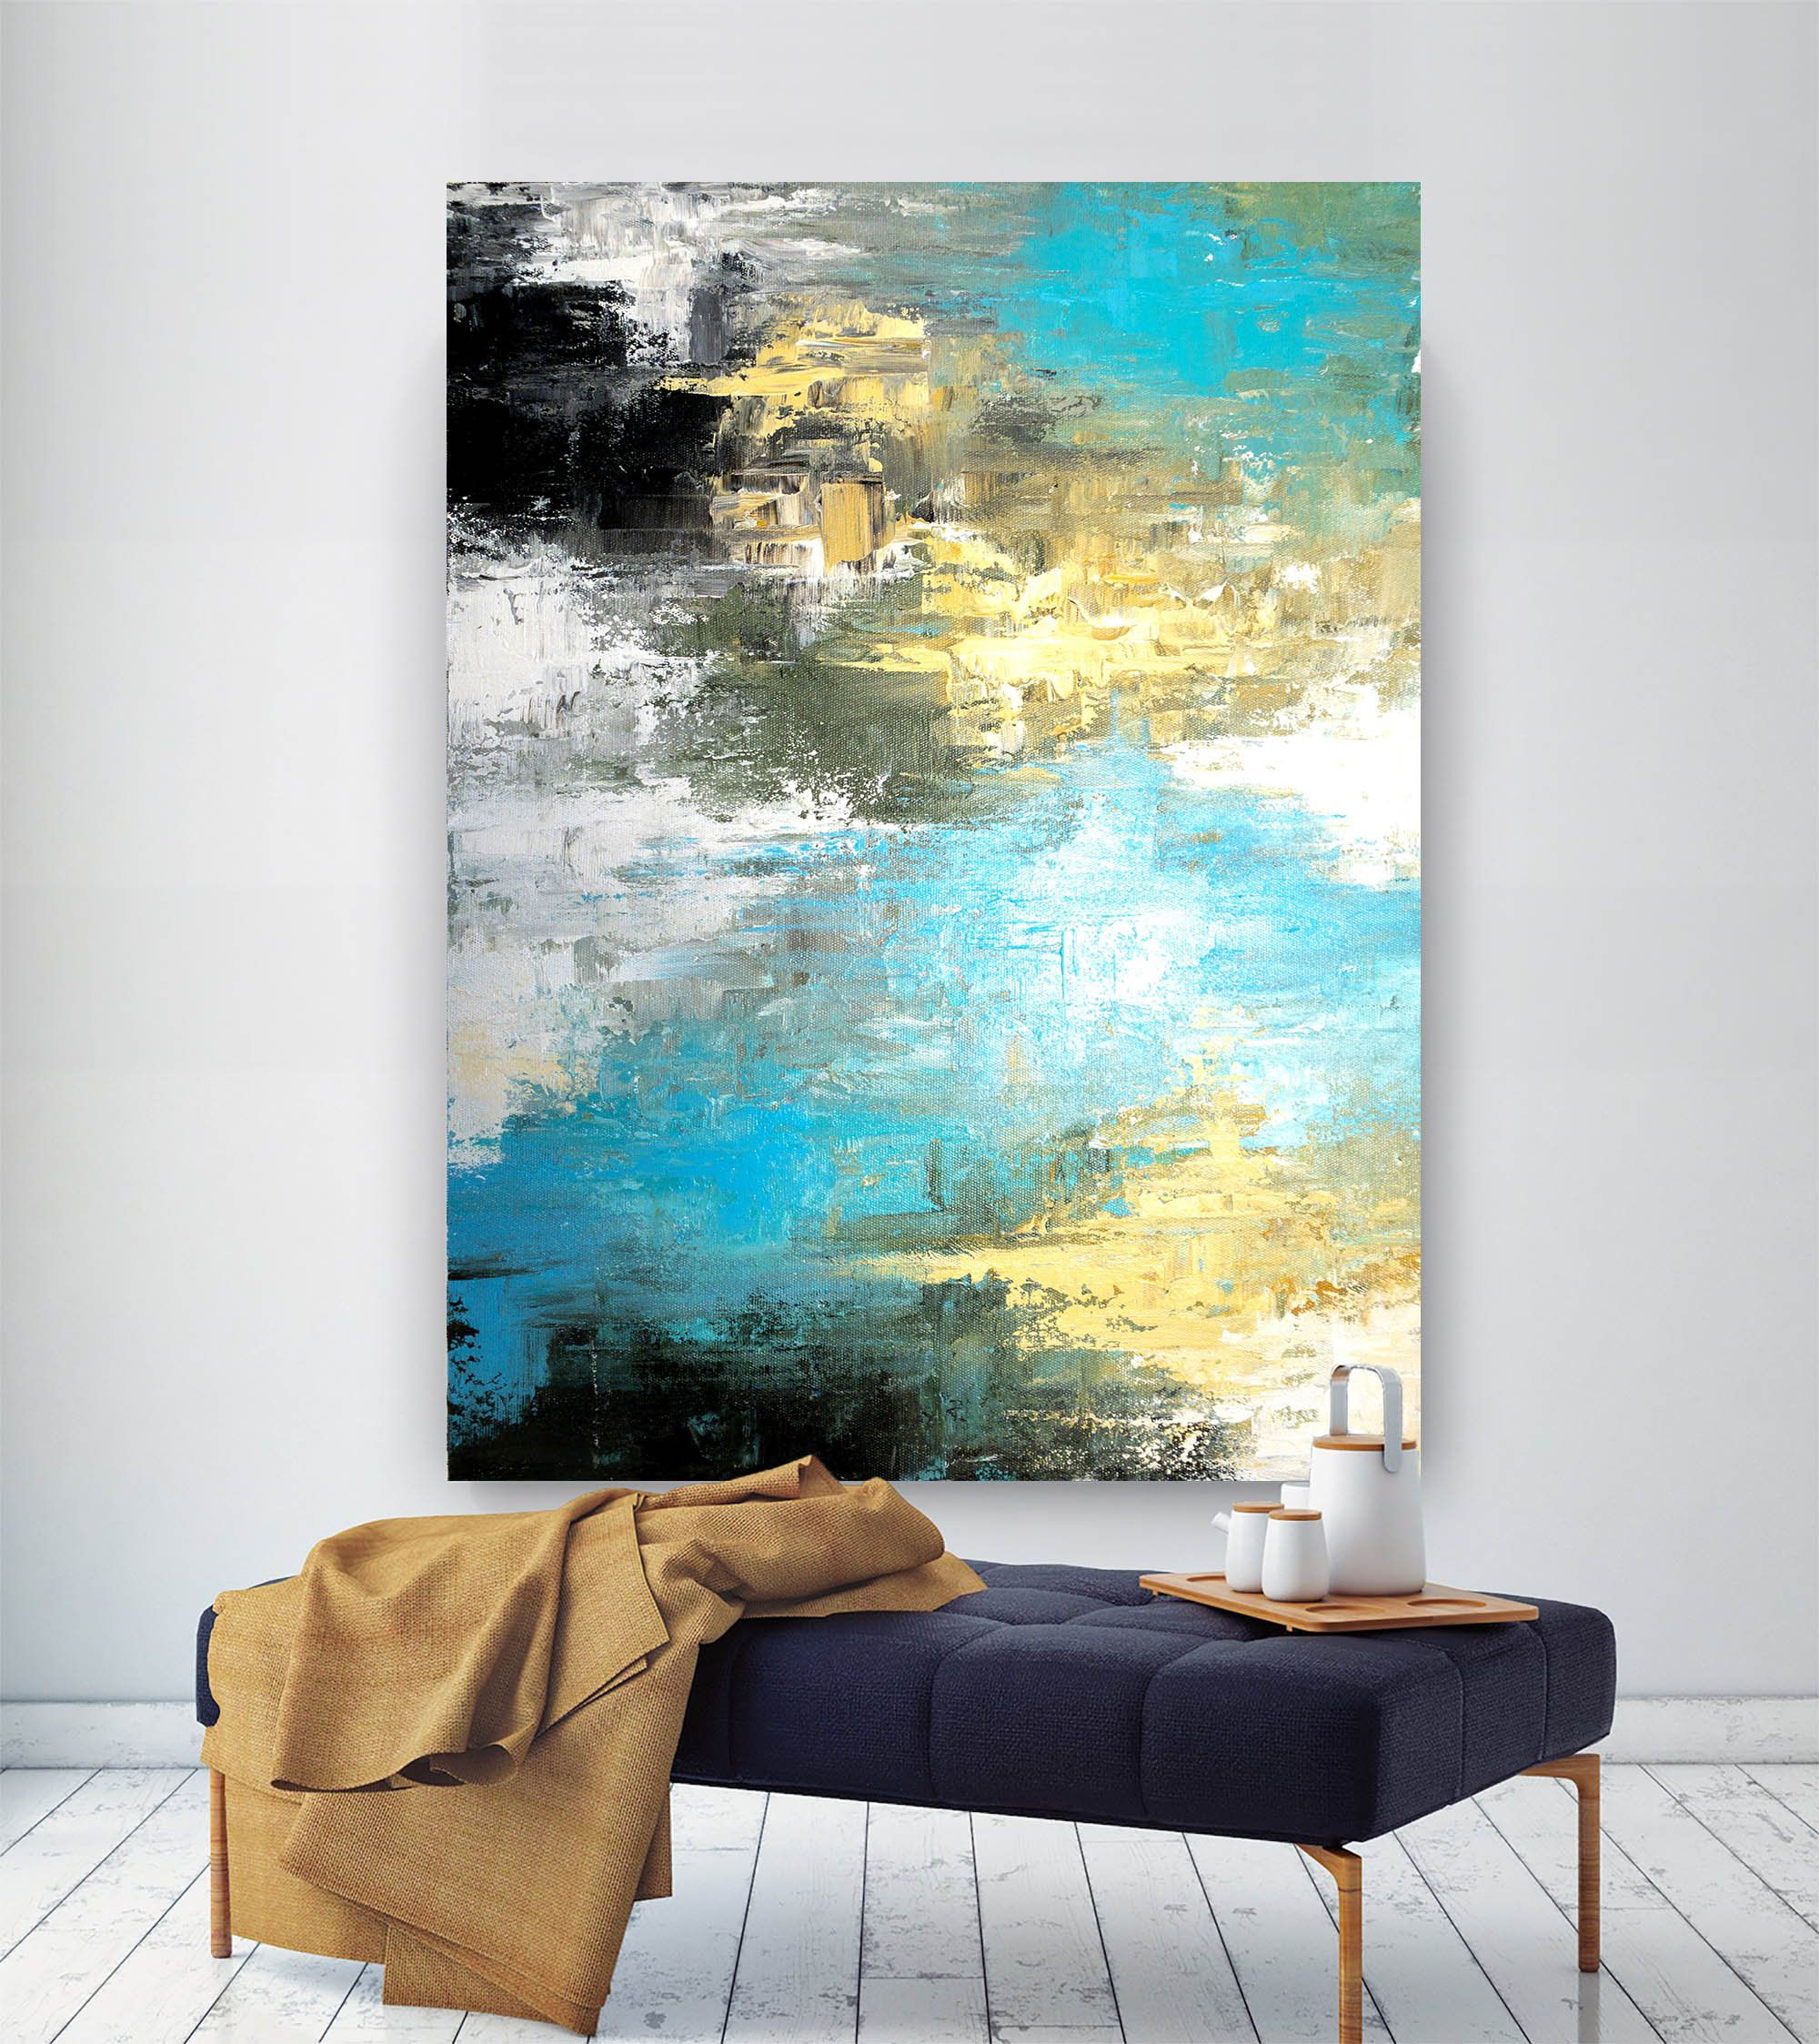 Large Modern Wall Art Paintinglarge Abstract Painting On Etsy Large Modern Wall Art Modern Abstract Painting Large Abstract Painting